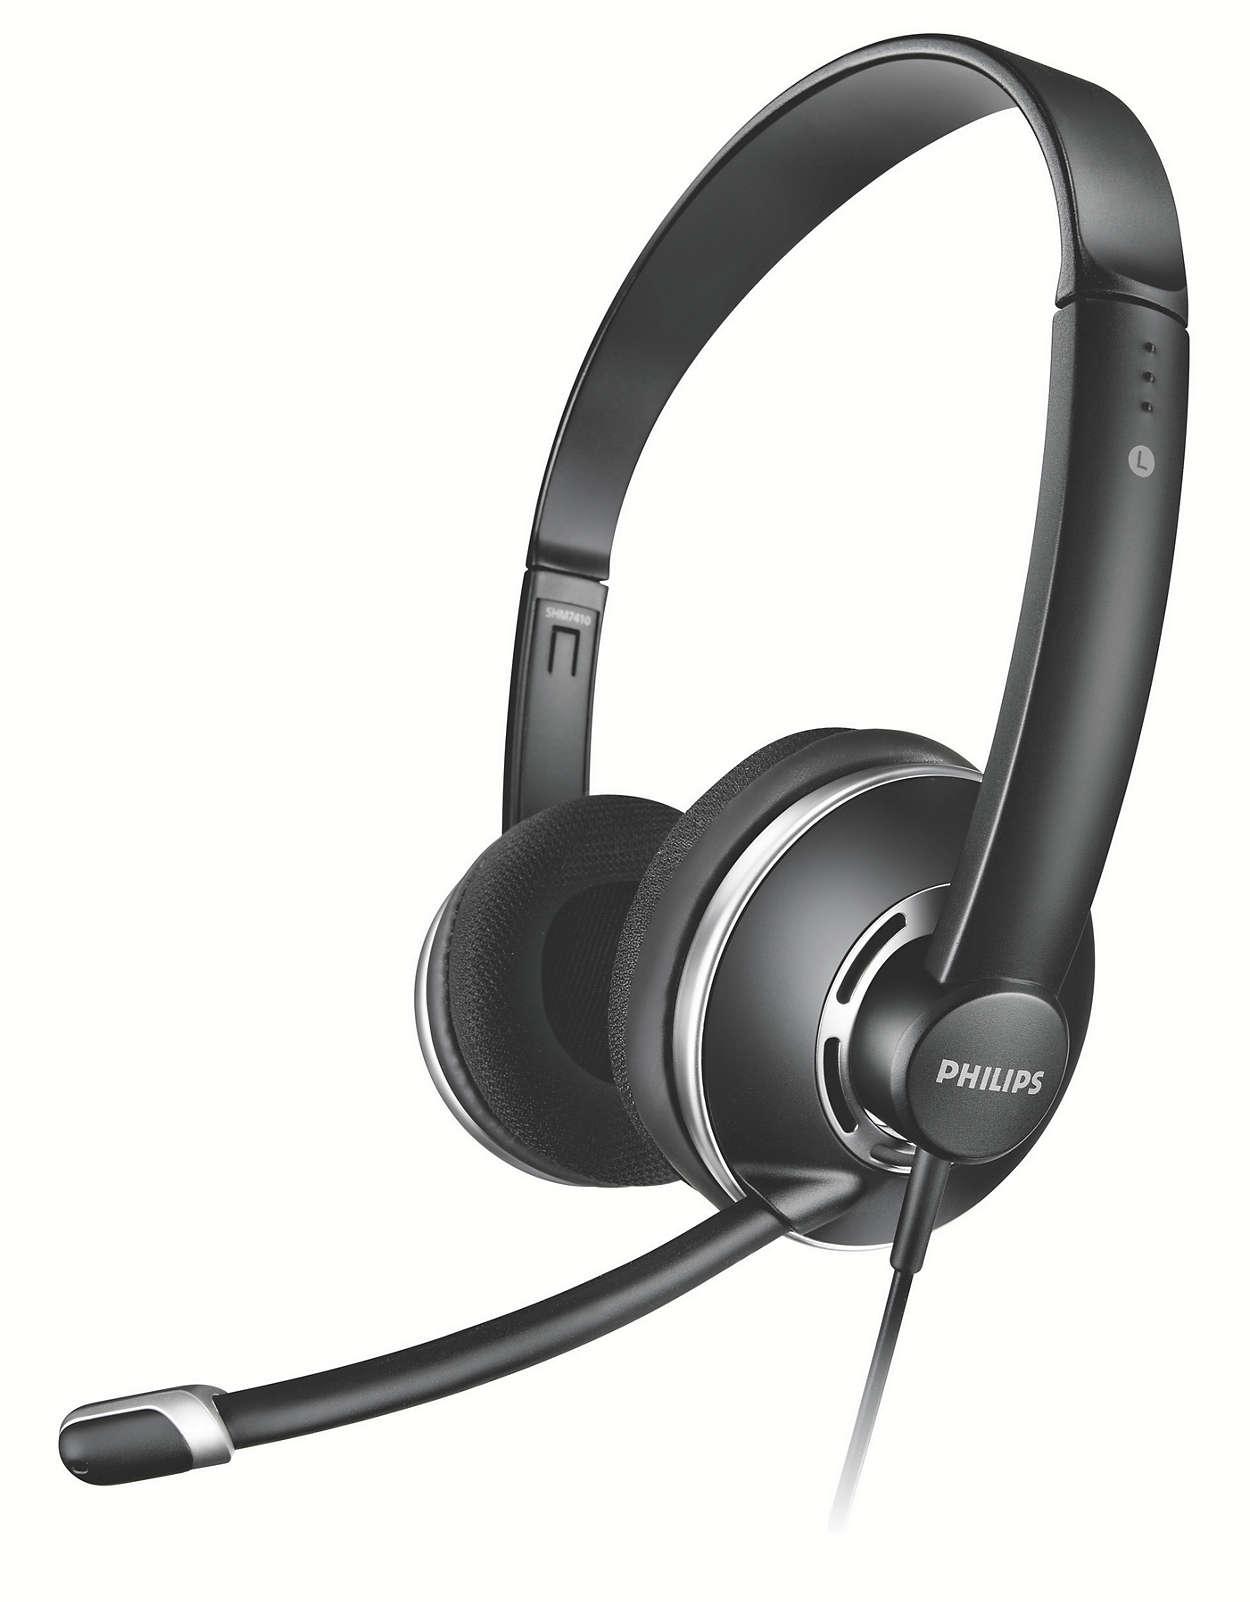 Стерео слушалки за компютър - нормален размер